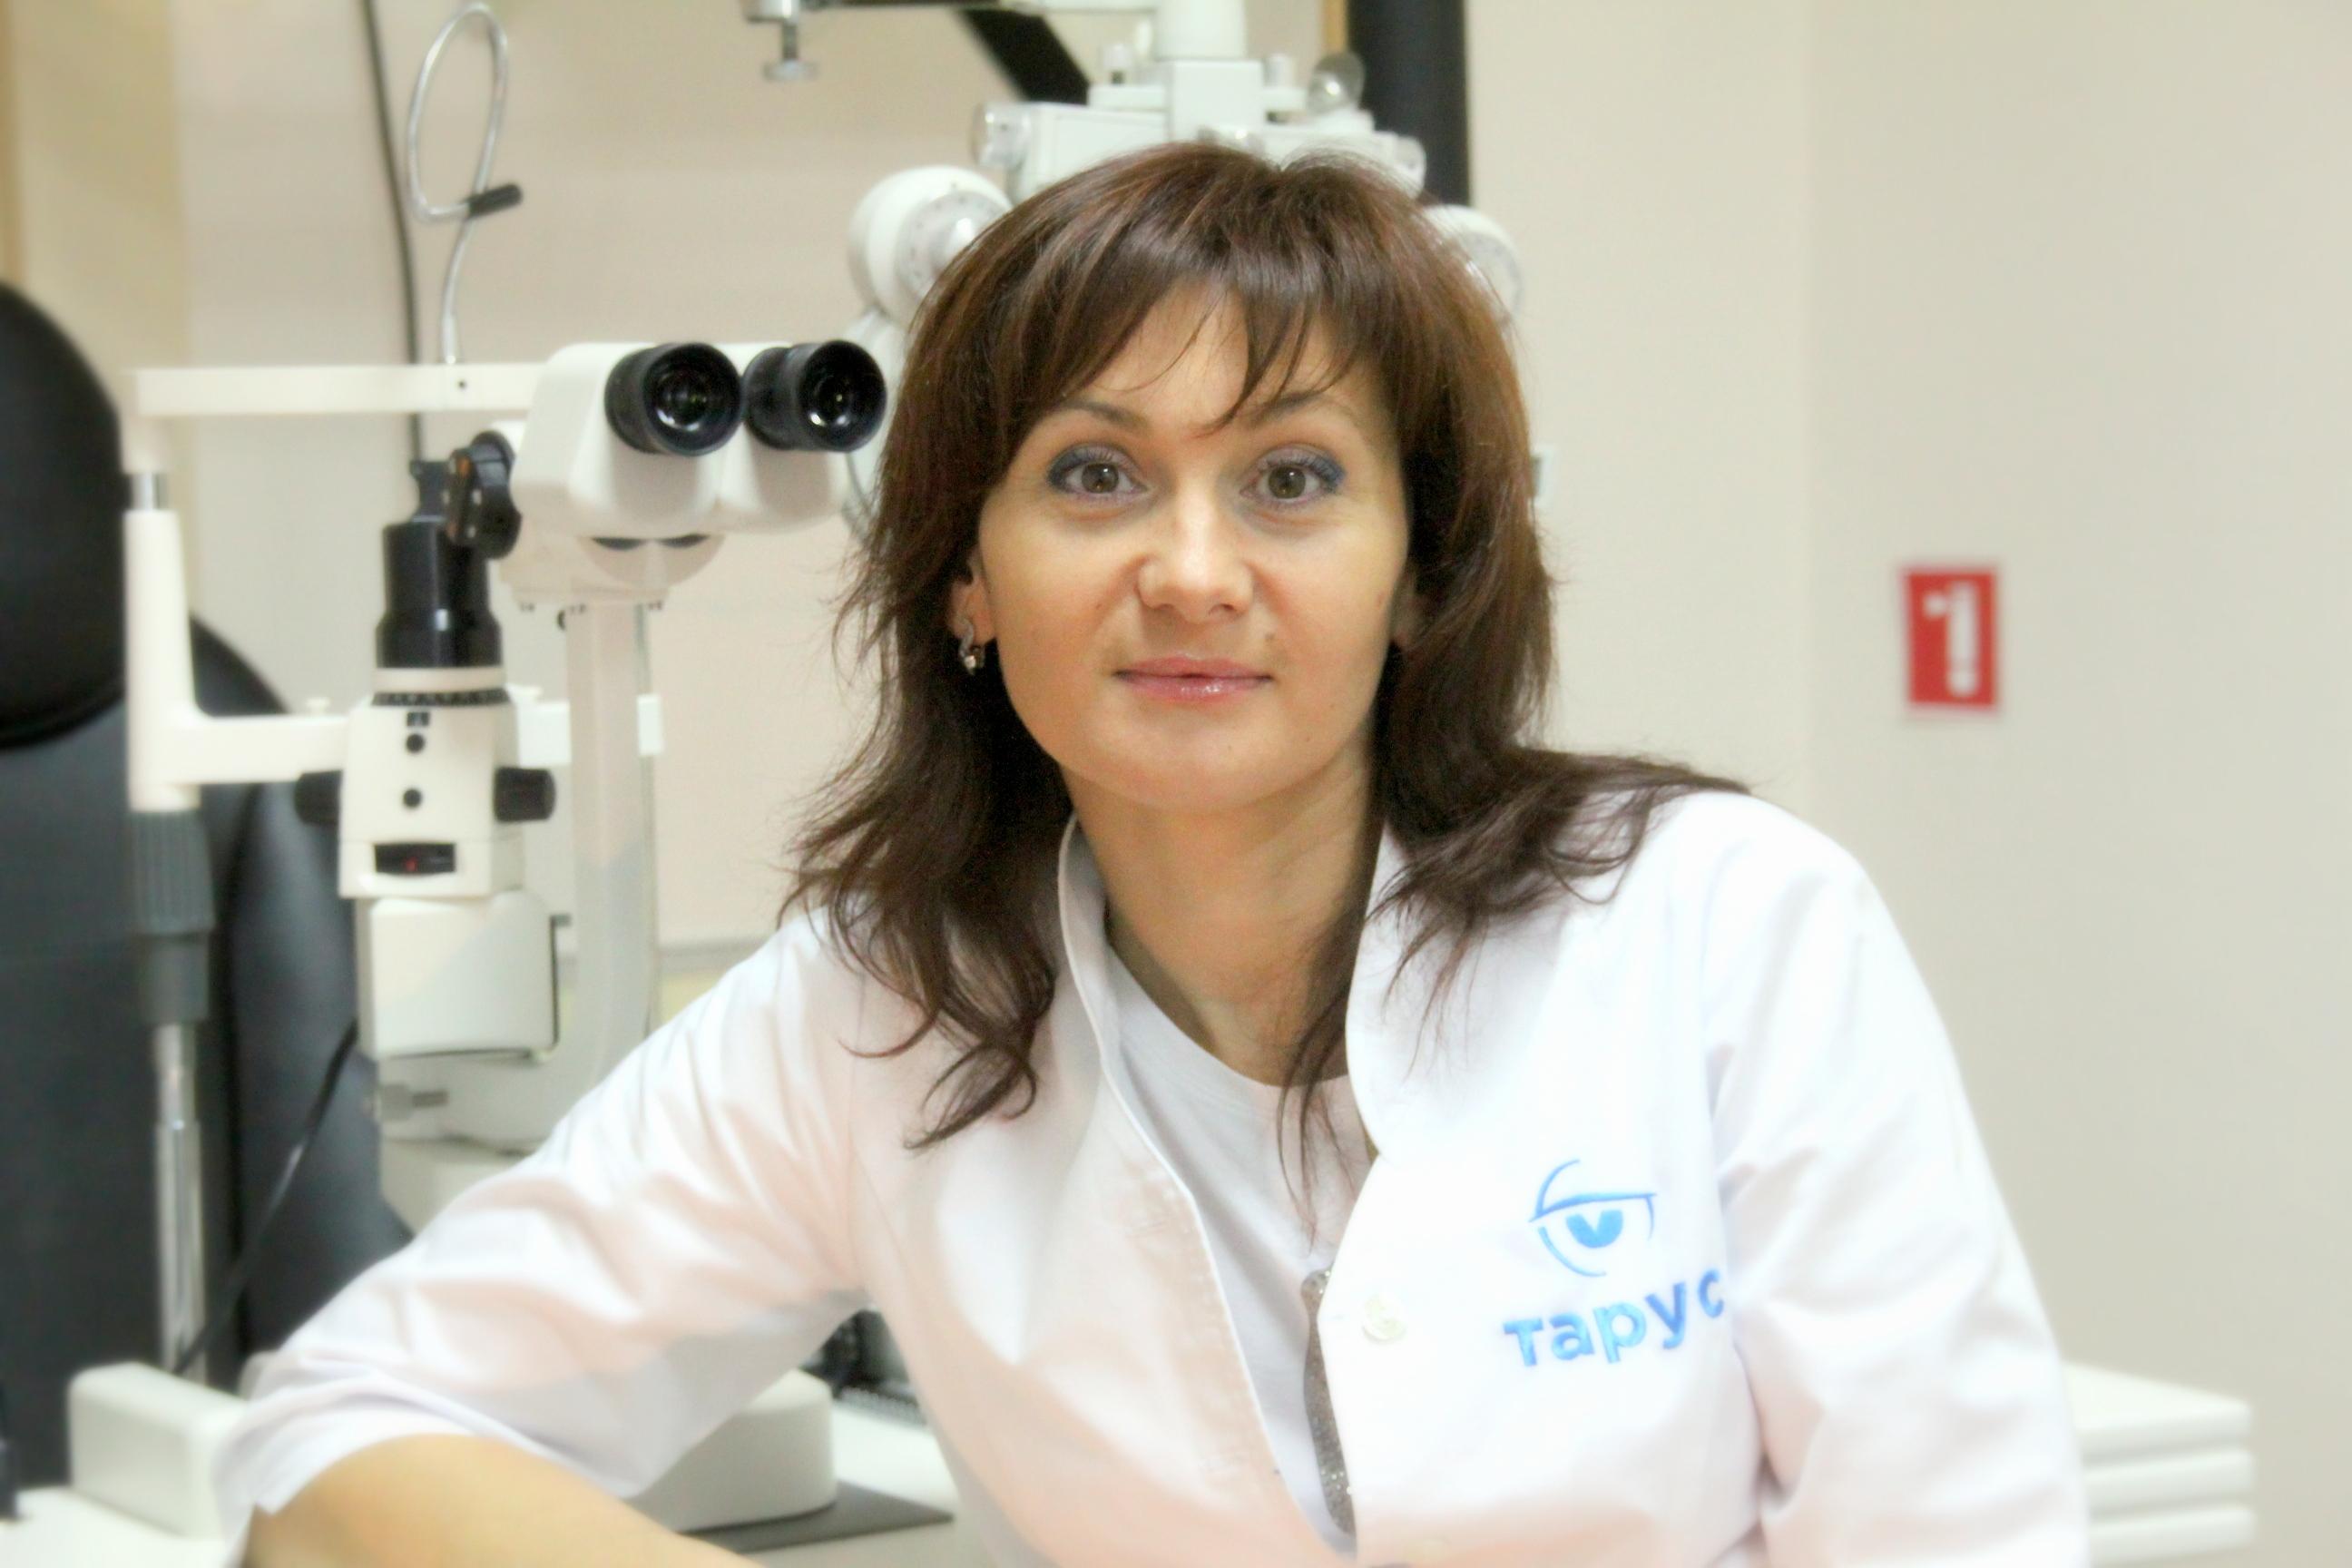 Захарова Оксана Николаевна - Тарус